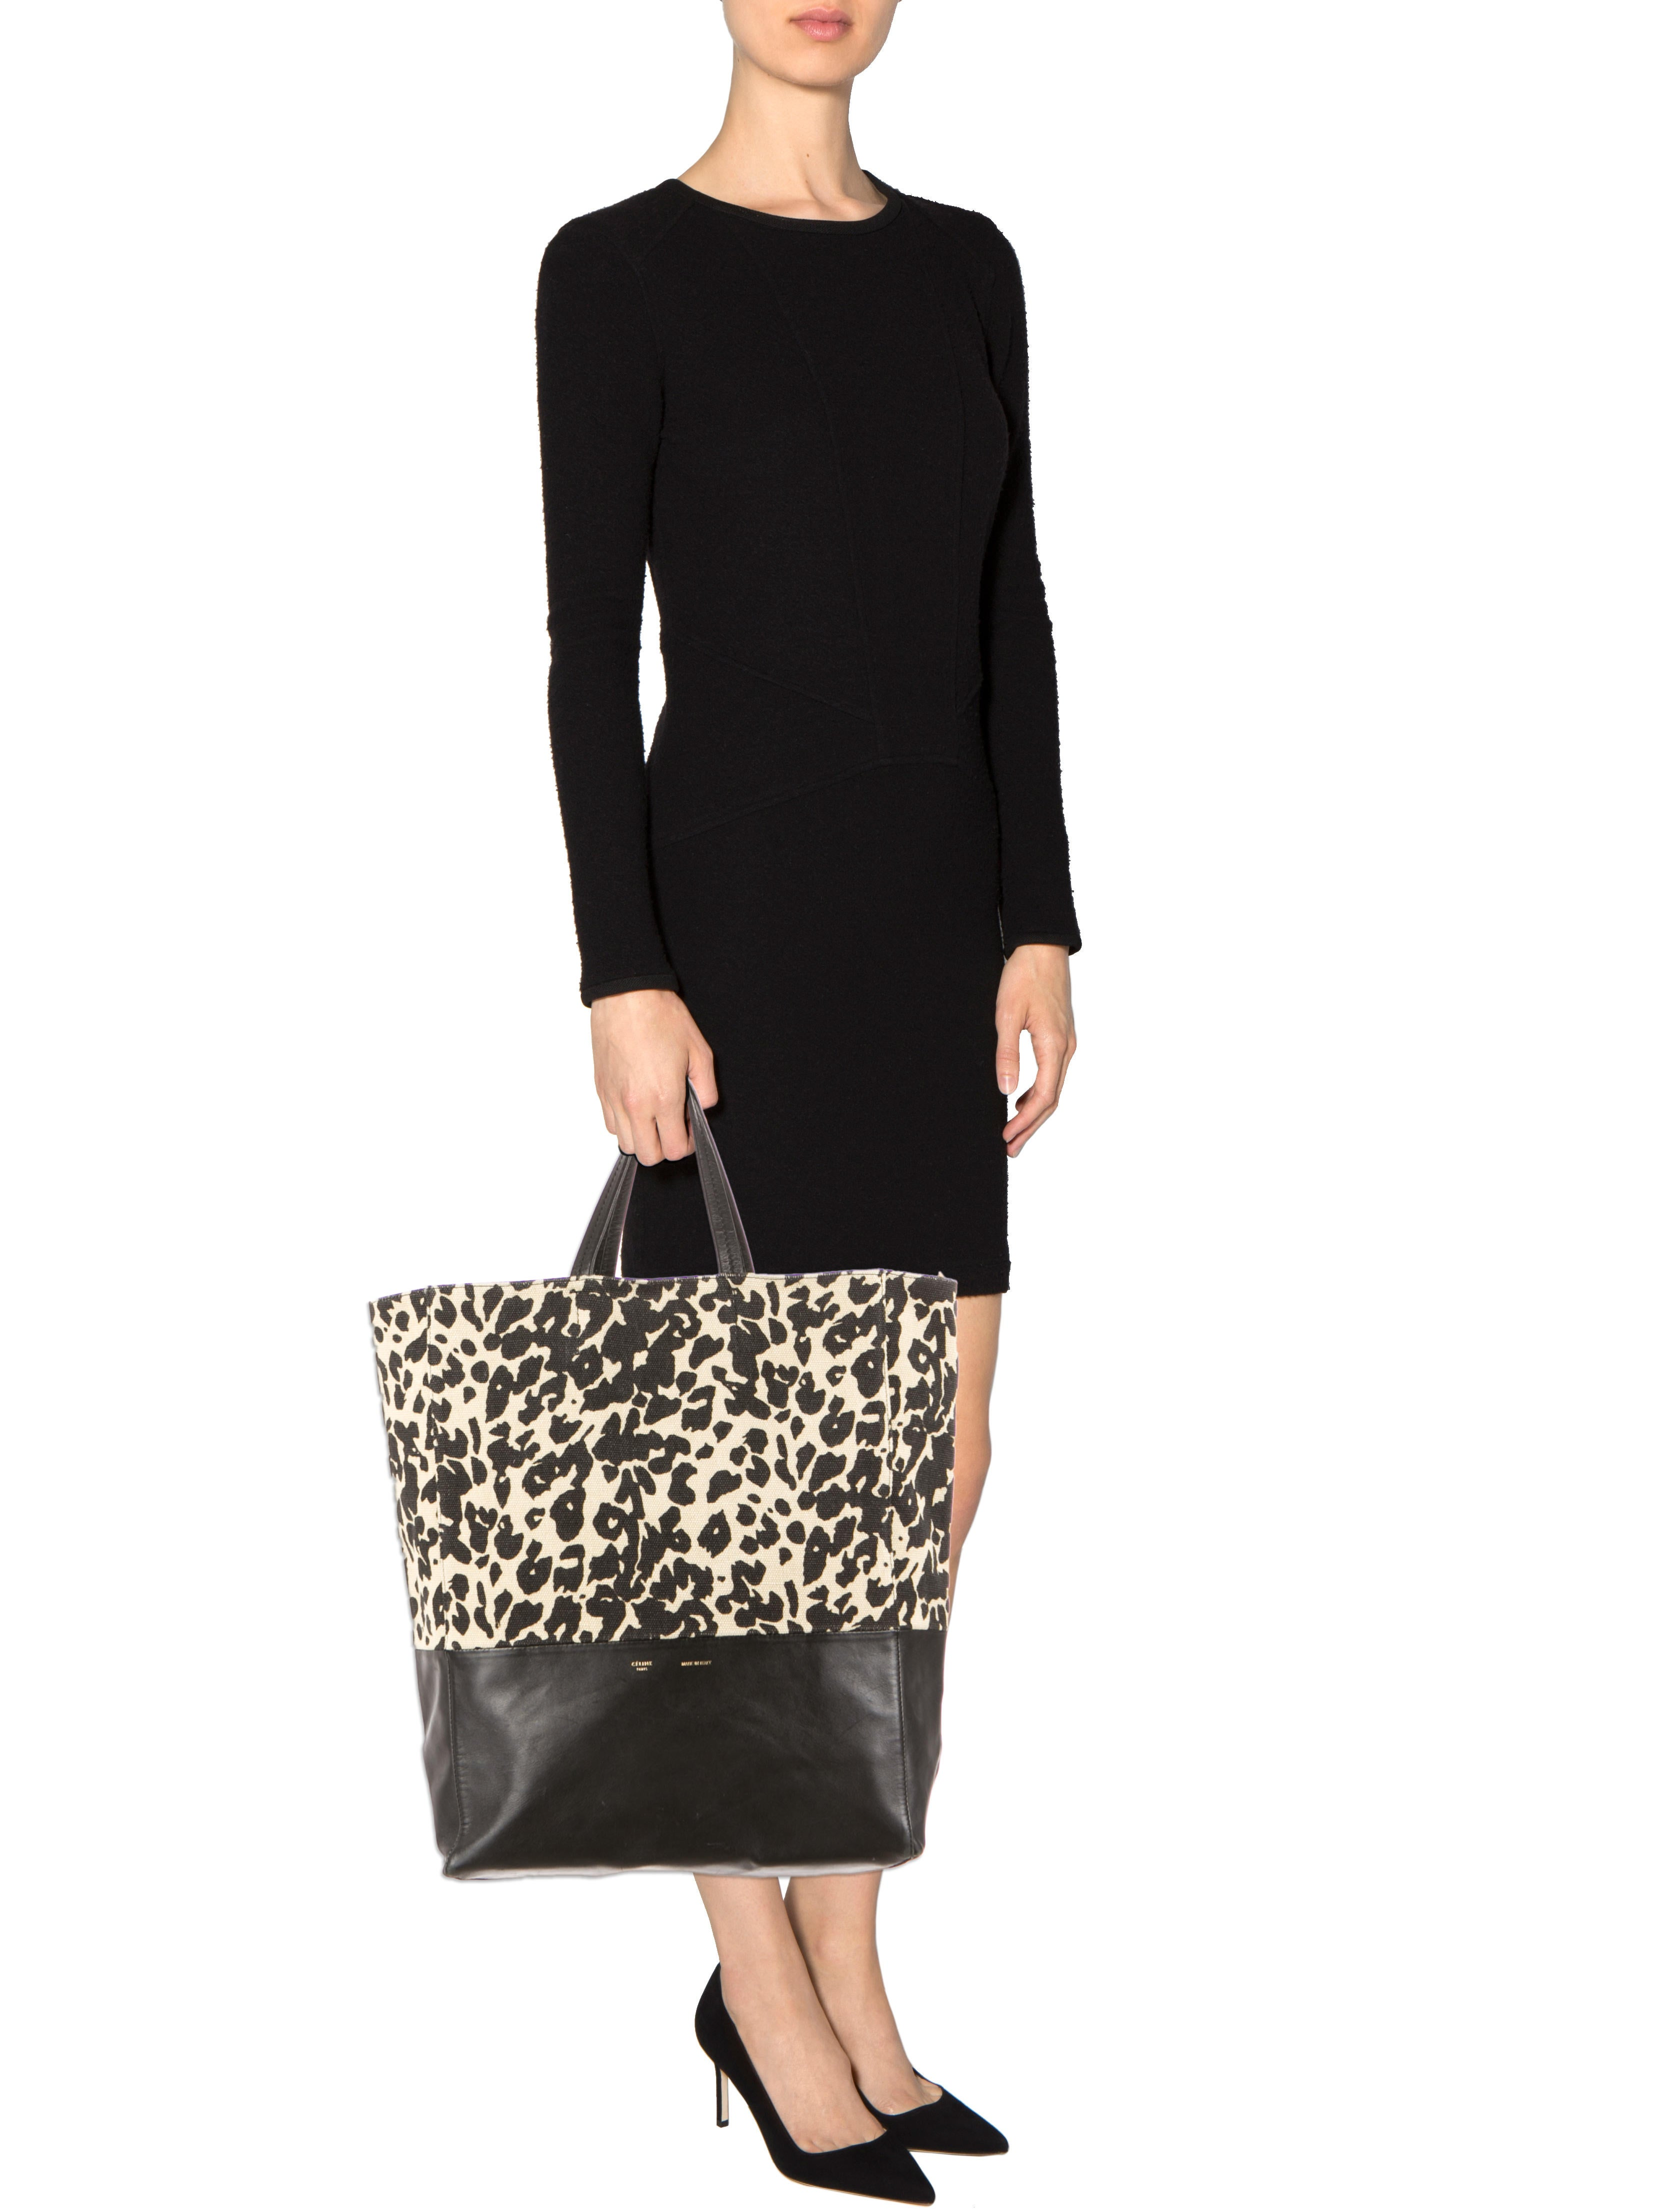 C¨¦line Leopard Print Bi-Cabas Tote - Handbags - CEL26847 | The ...